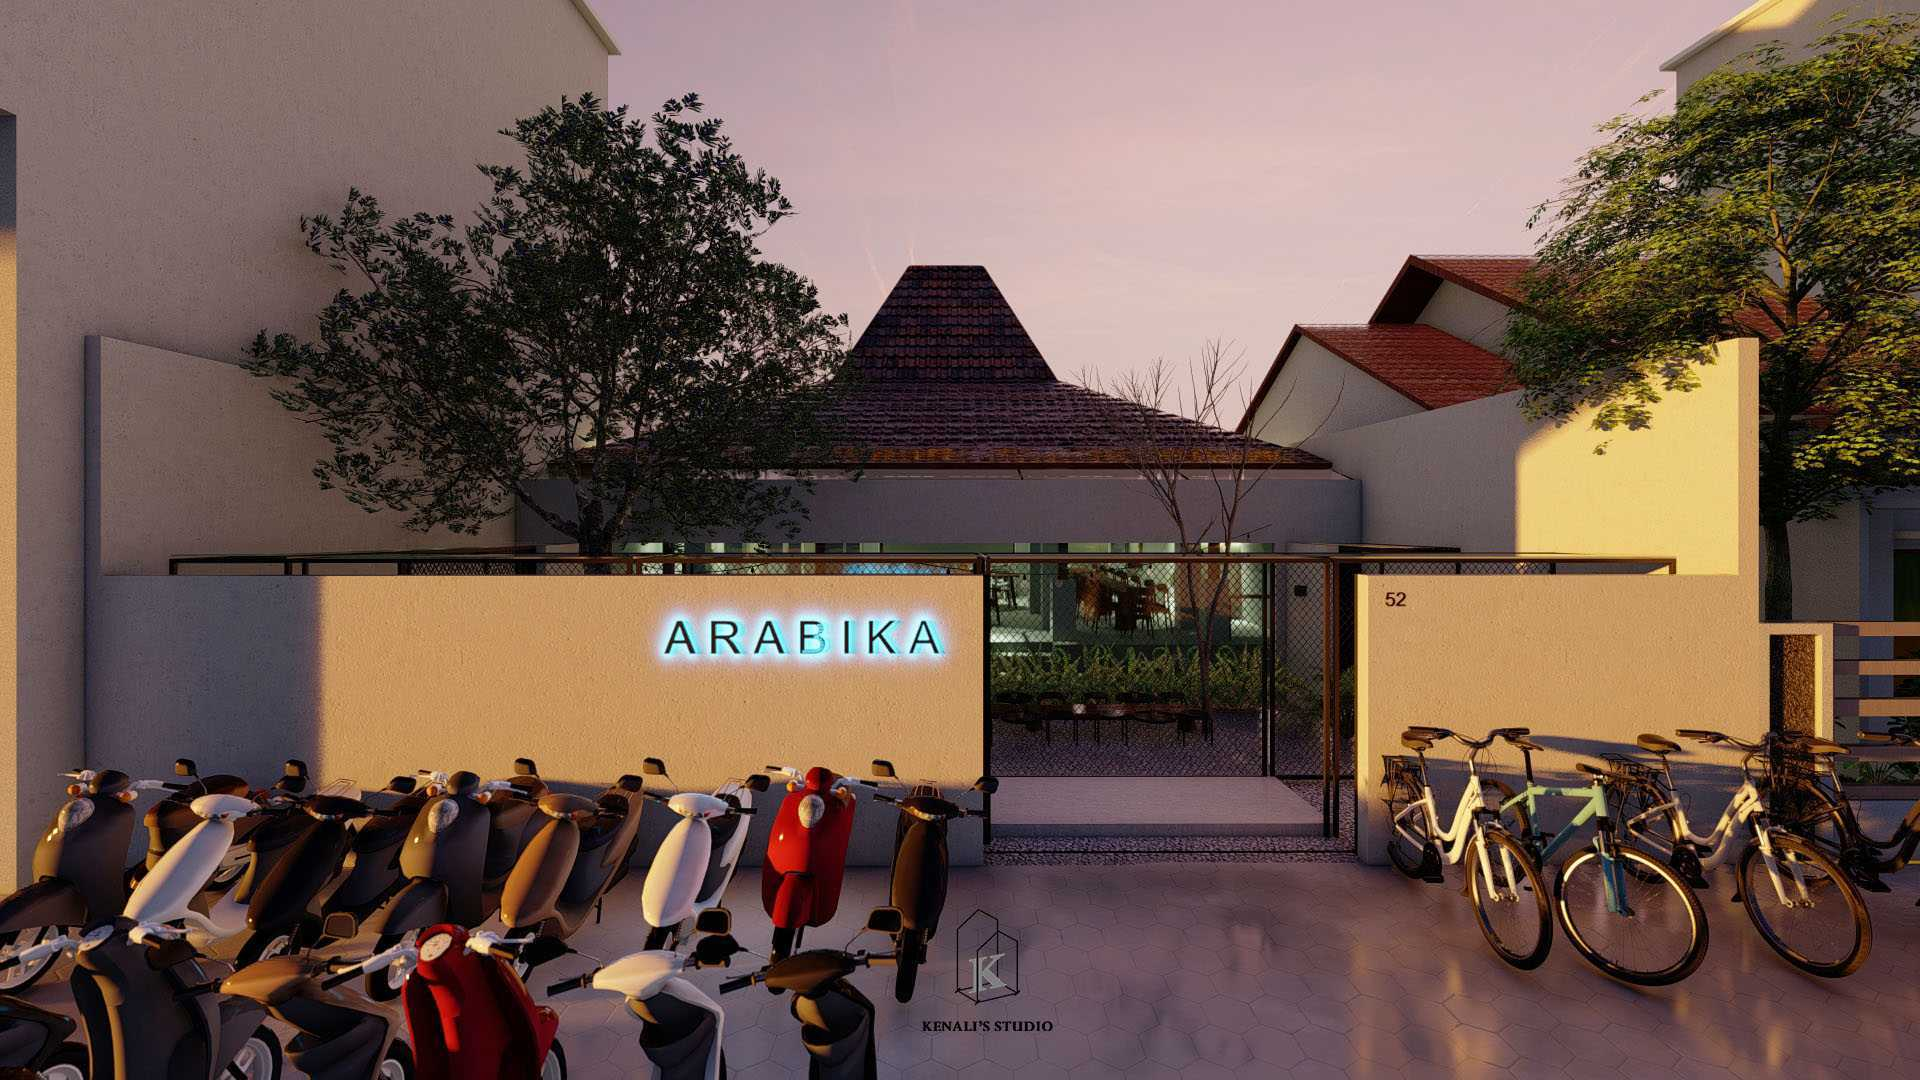 Kenali's Studio Arabika Cafe Semarang, Kota Semarang, Jawa Tengah, Indonesia Semarang, Kota Semarang, Jawa Tengah, Indonesia Kenalis-Studio-Arabika-Cafe Scandinavian 93651